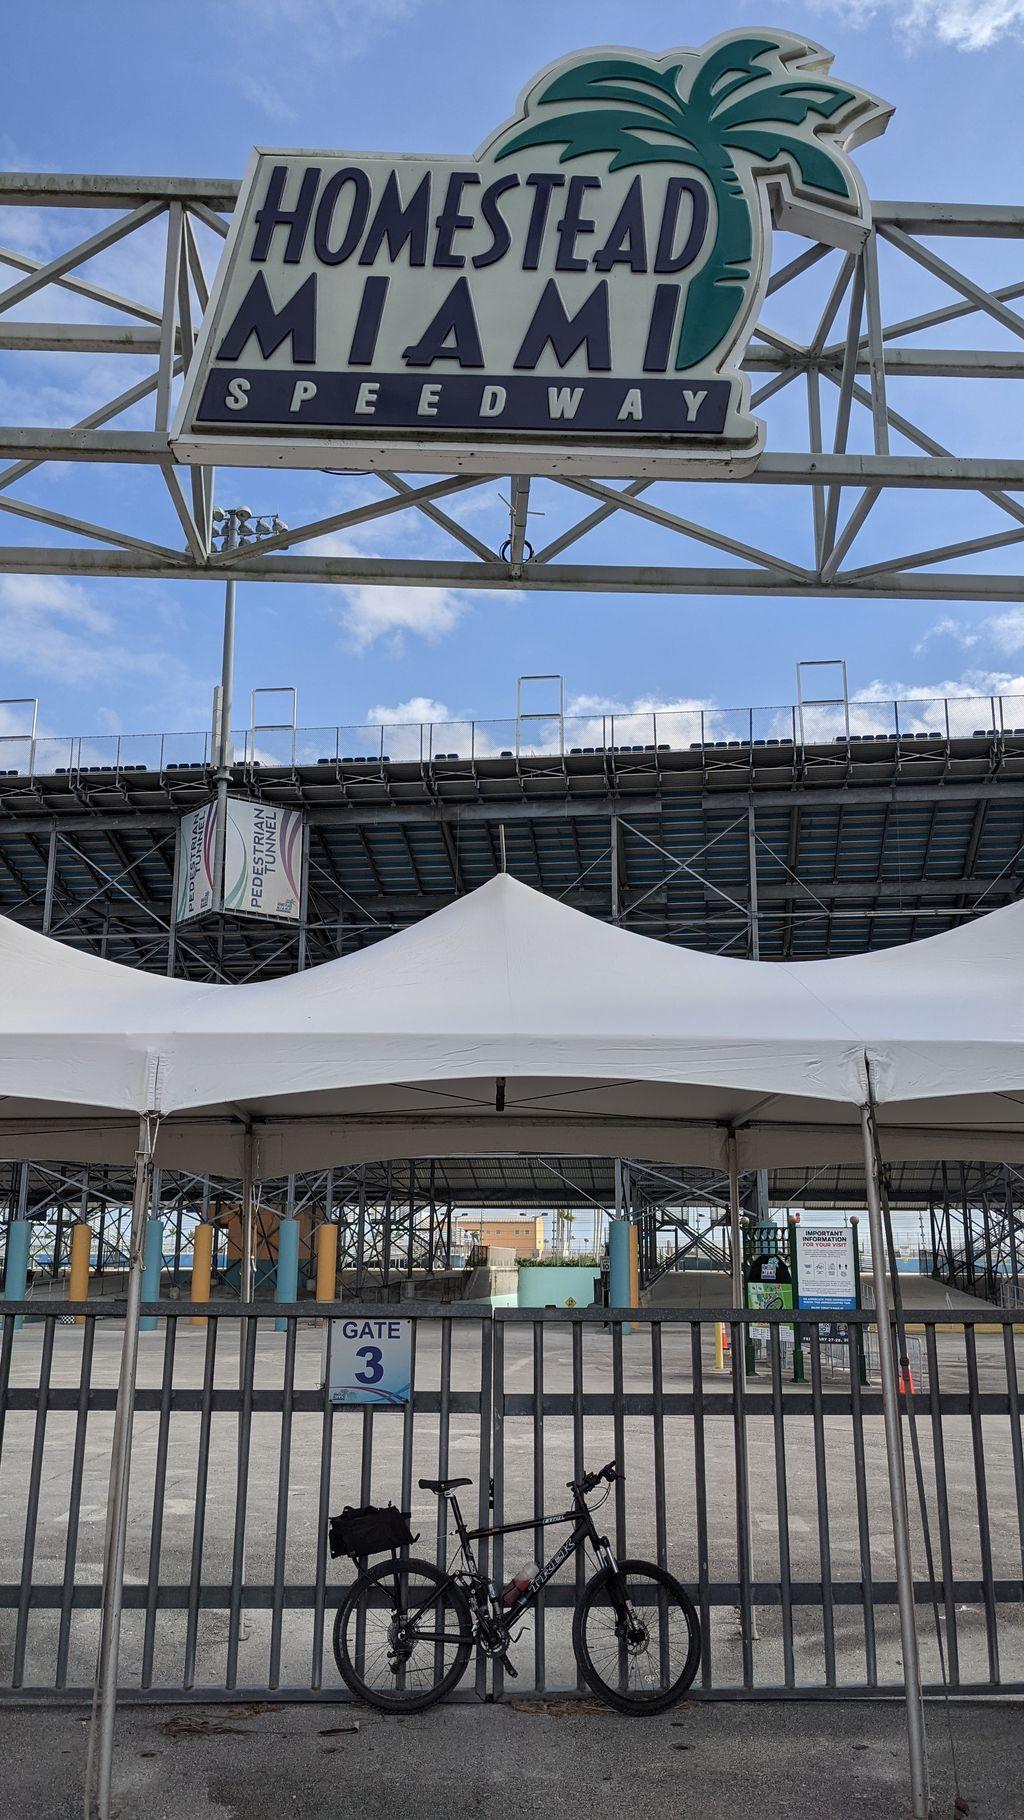 Trek Fuel 70 at Homestead Miami Speedway